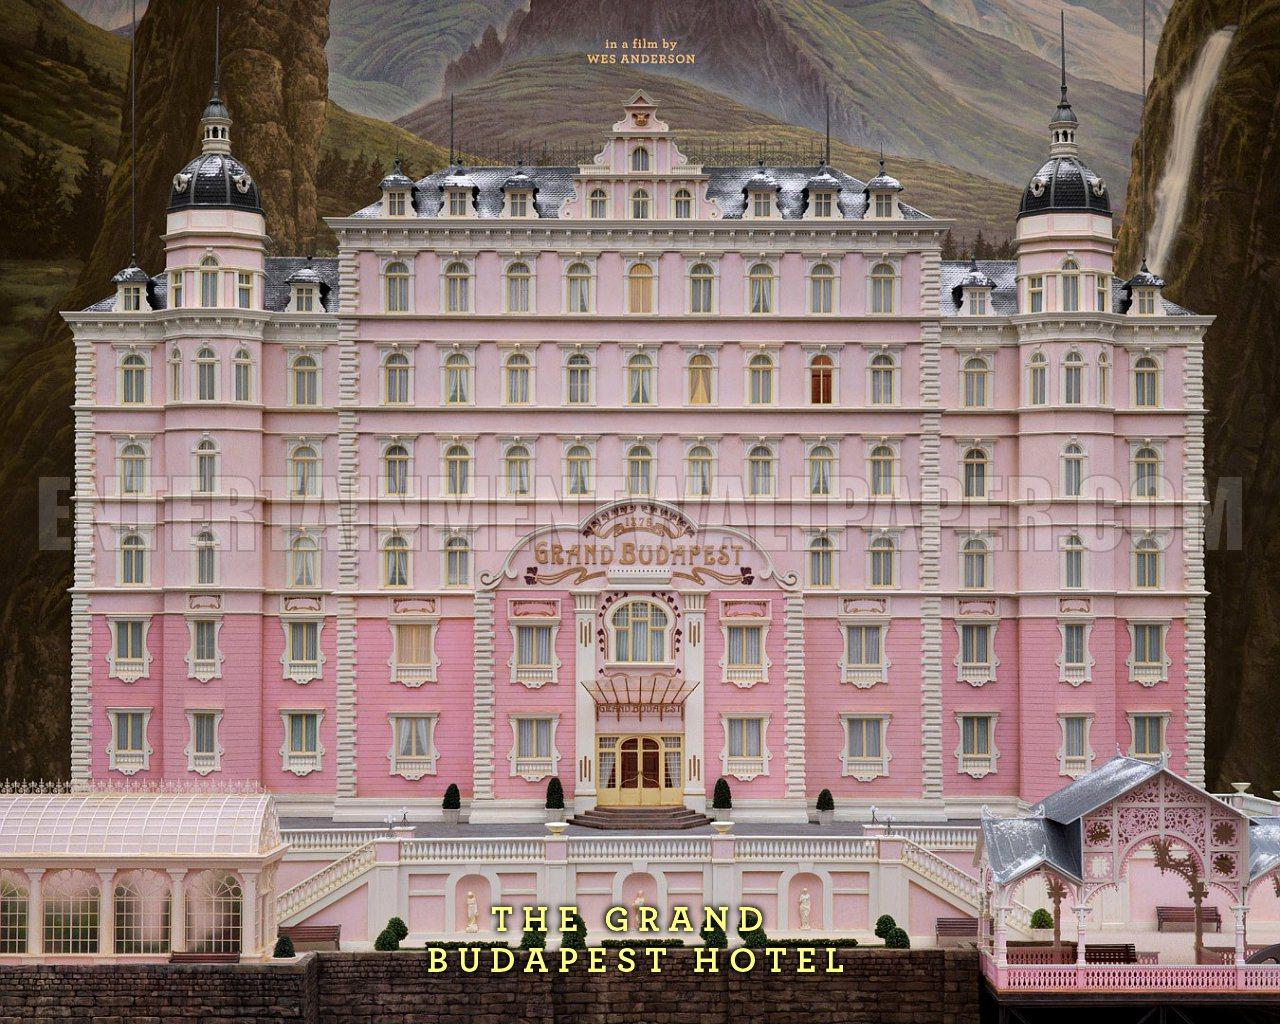 Best 56 The Grand Budapest Hotel Wallpaper on HipWallpaper The 1280x1024